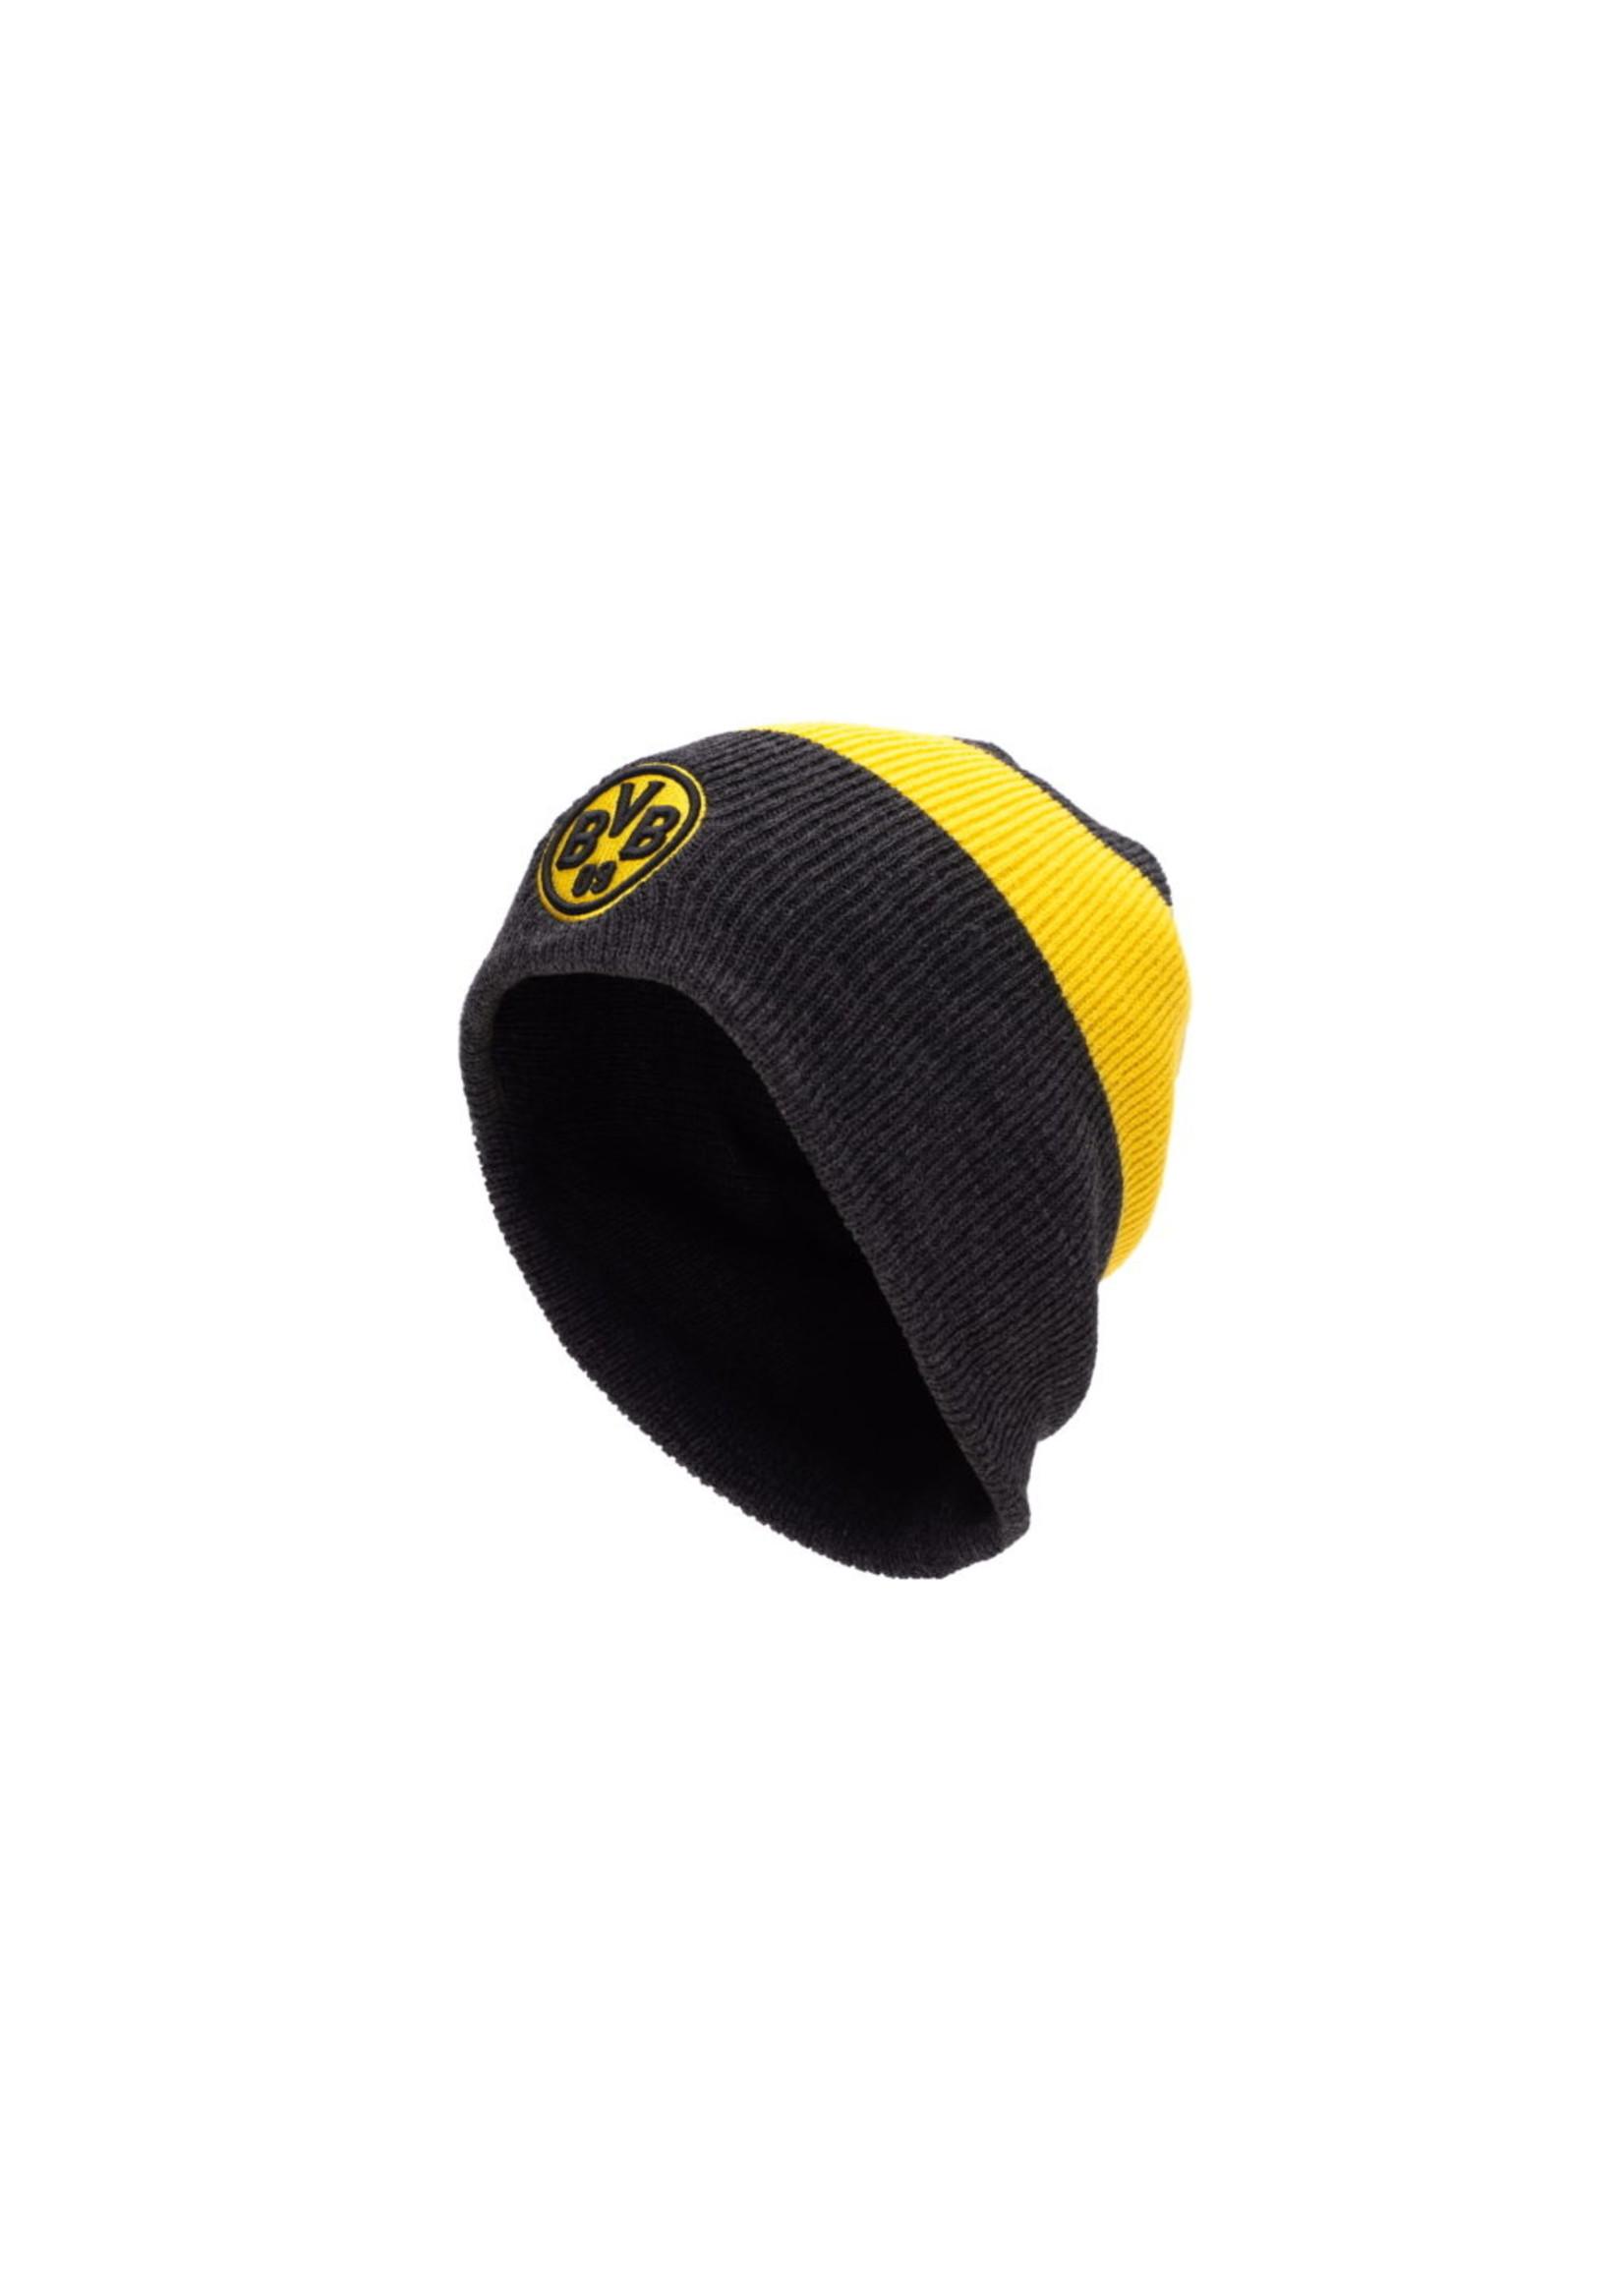 Borussia Dortmund Fury Knit Beanie